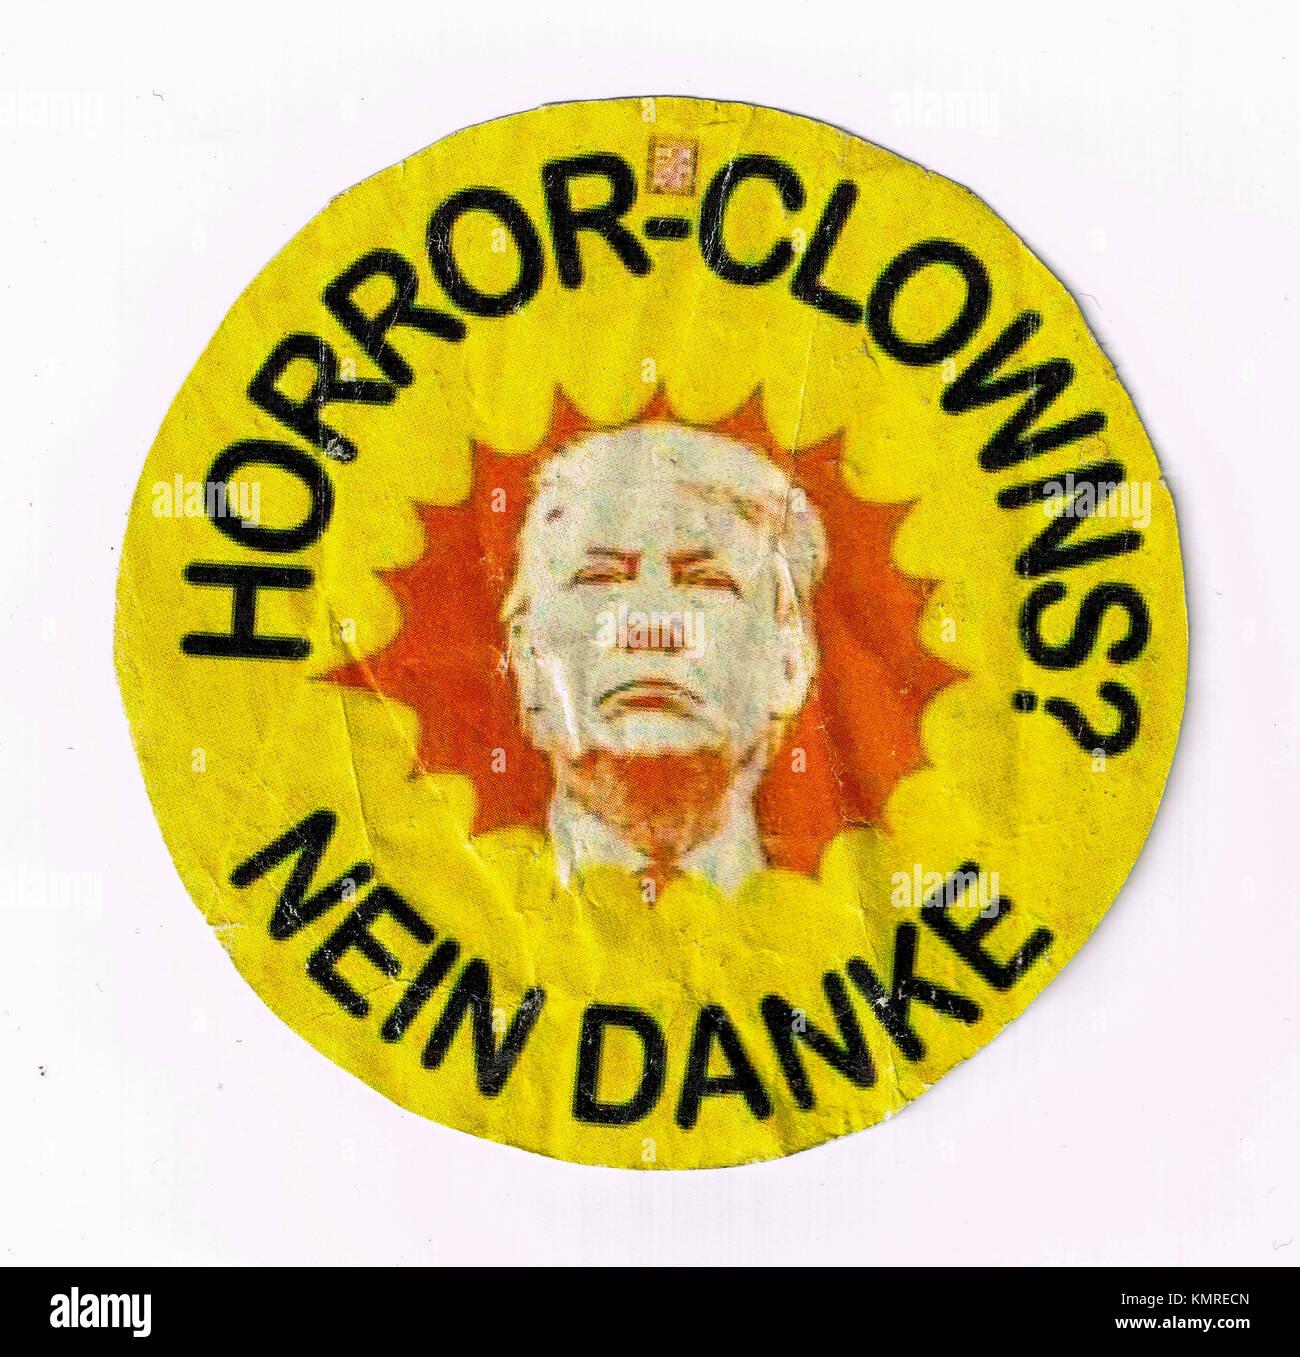 Anti-G20 stickers protest Donald Trump presence in Hamburg, Germany - Stock Image